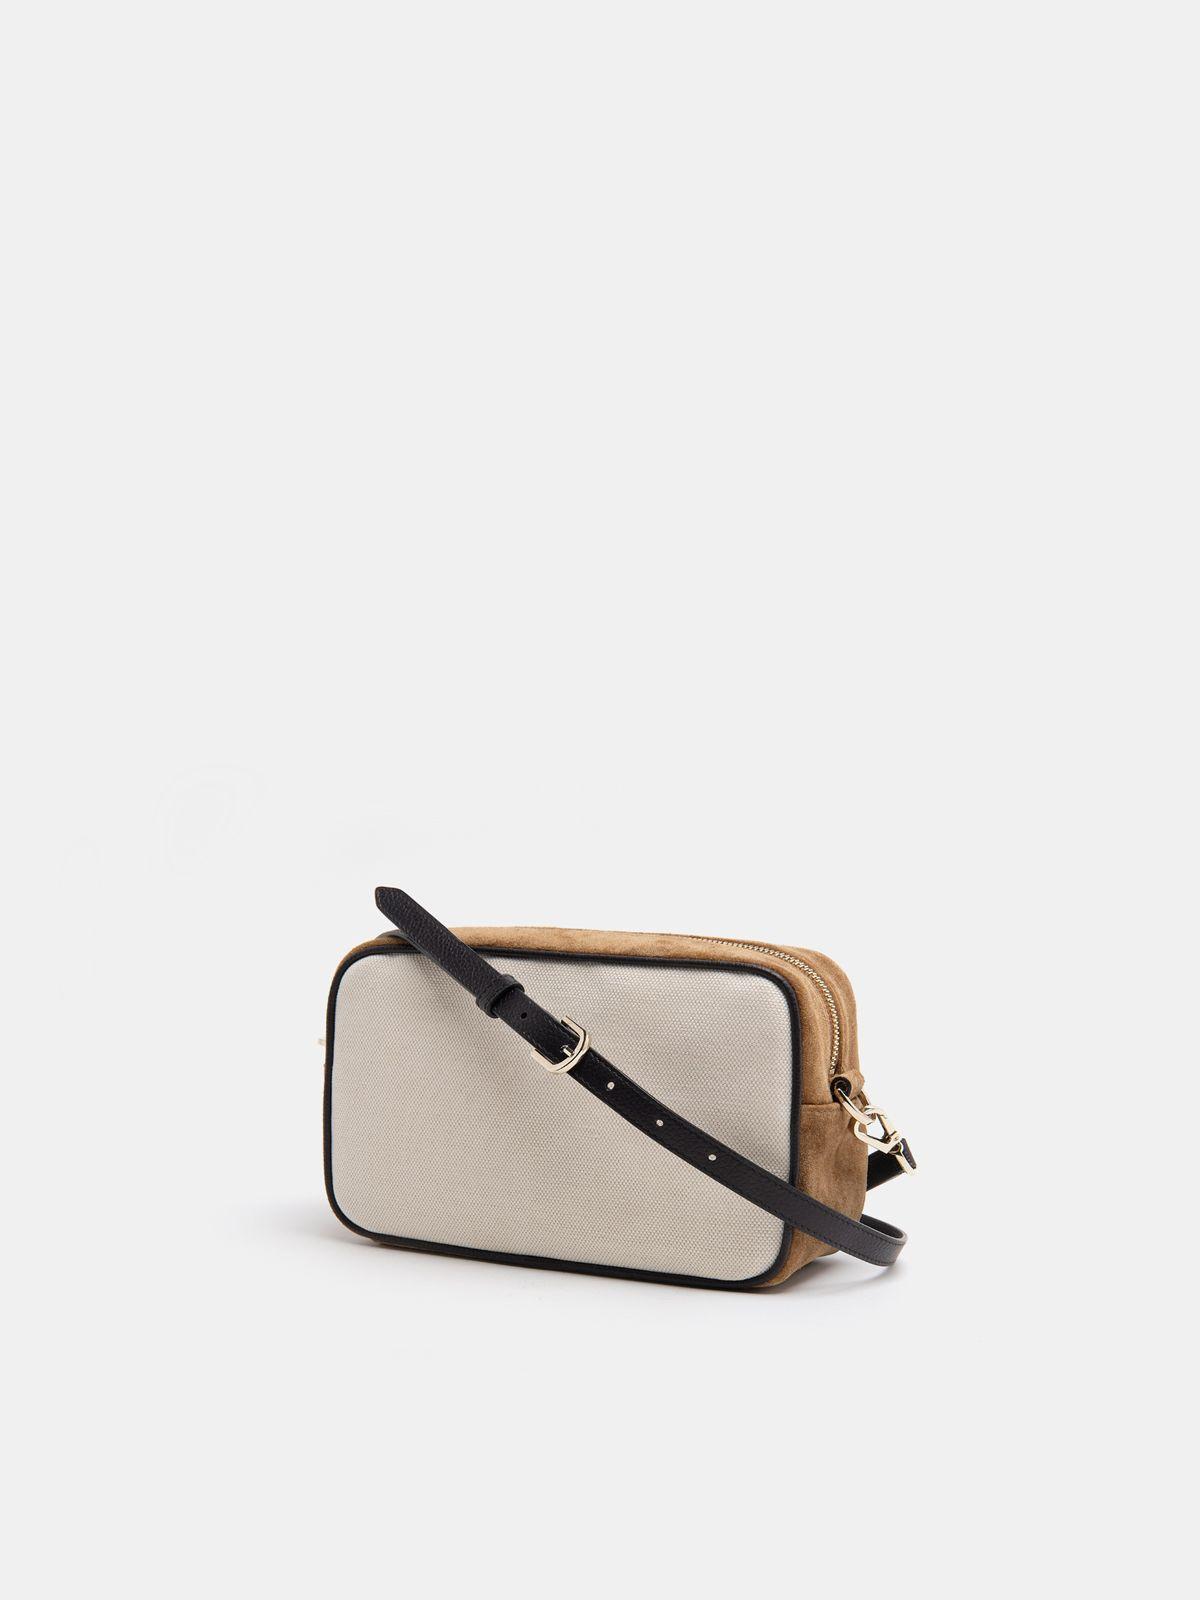 Golden Goose - Borsa Star Bag in tela e pelle scamosciata marrone stella nera in